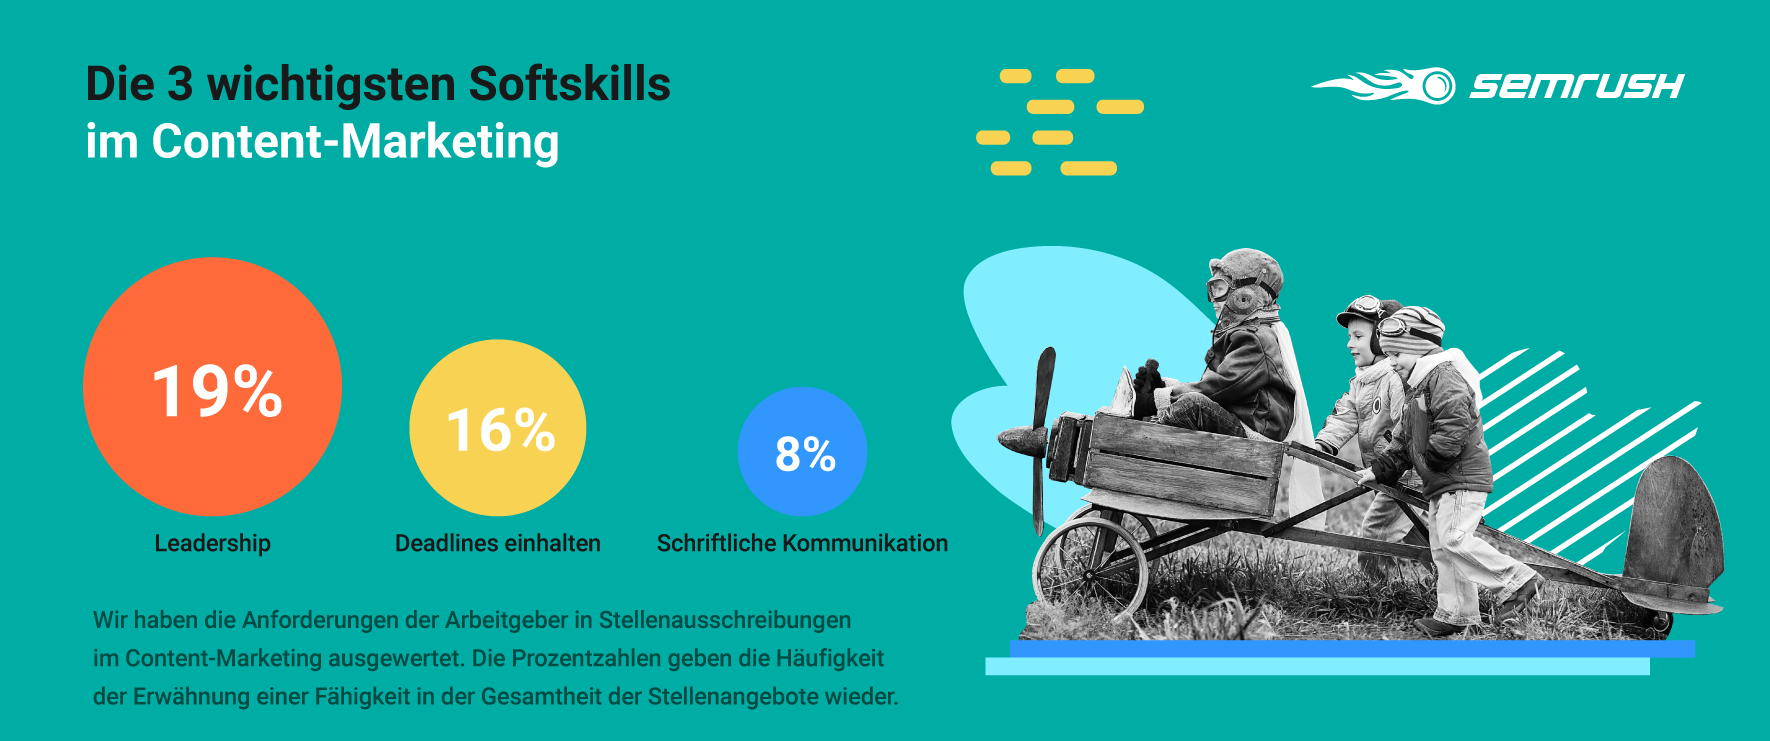 Content-Marketing: Softskills